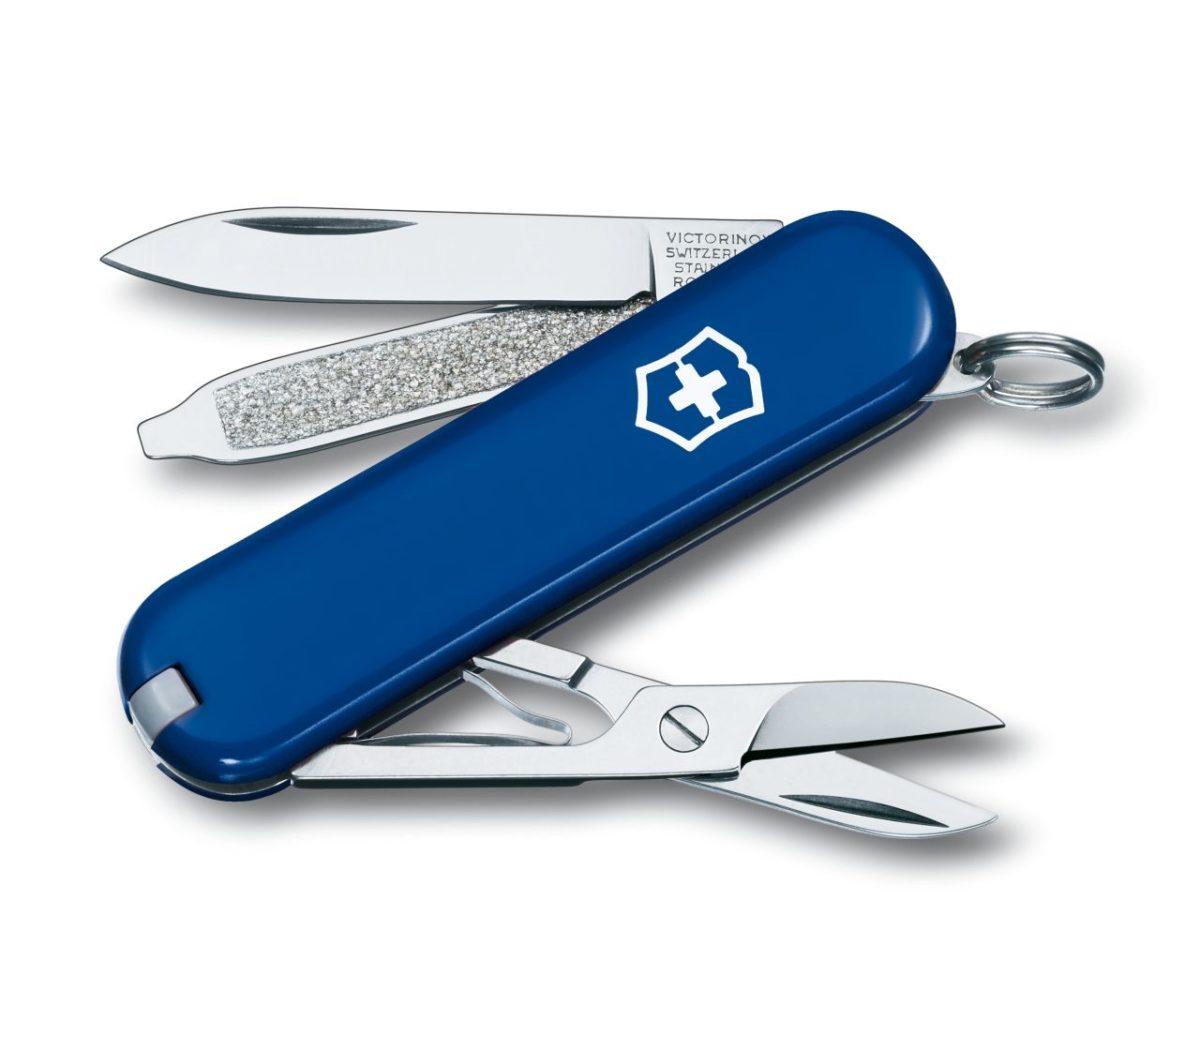 Victorinox Swiss Army Classic SD Blue Knife